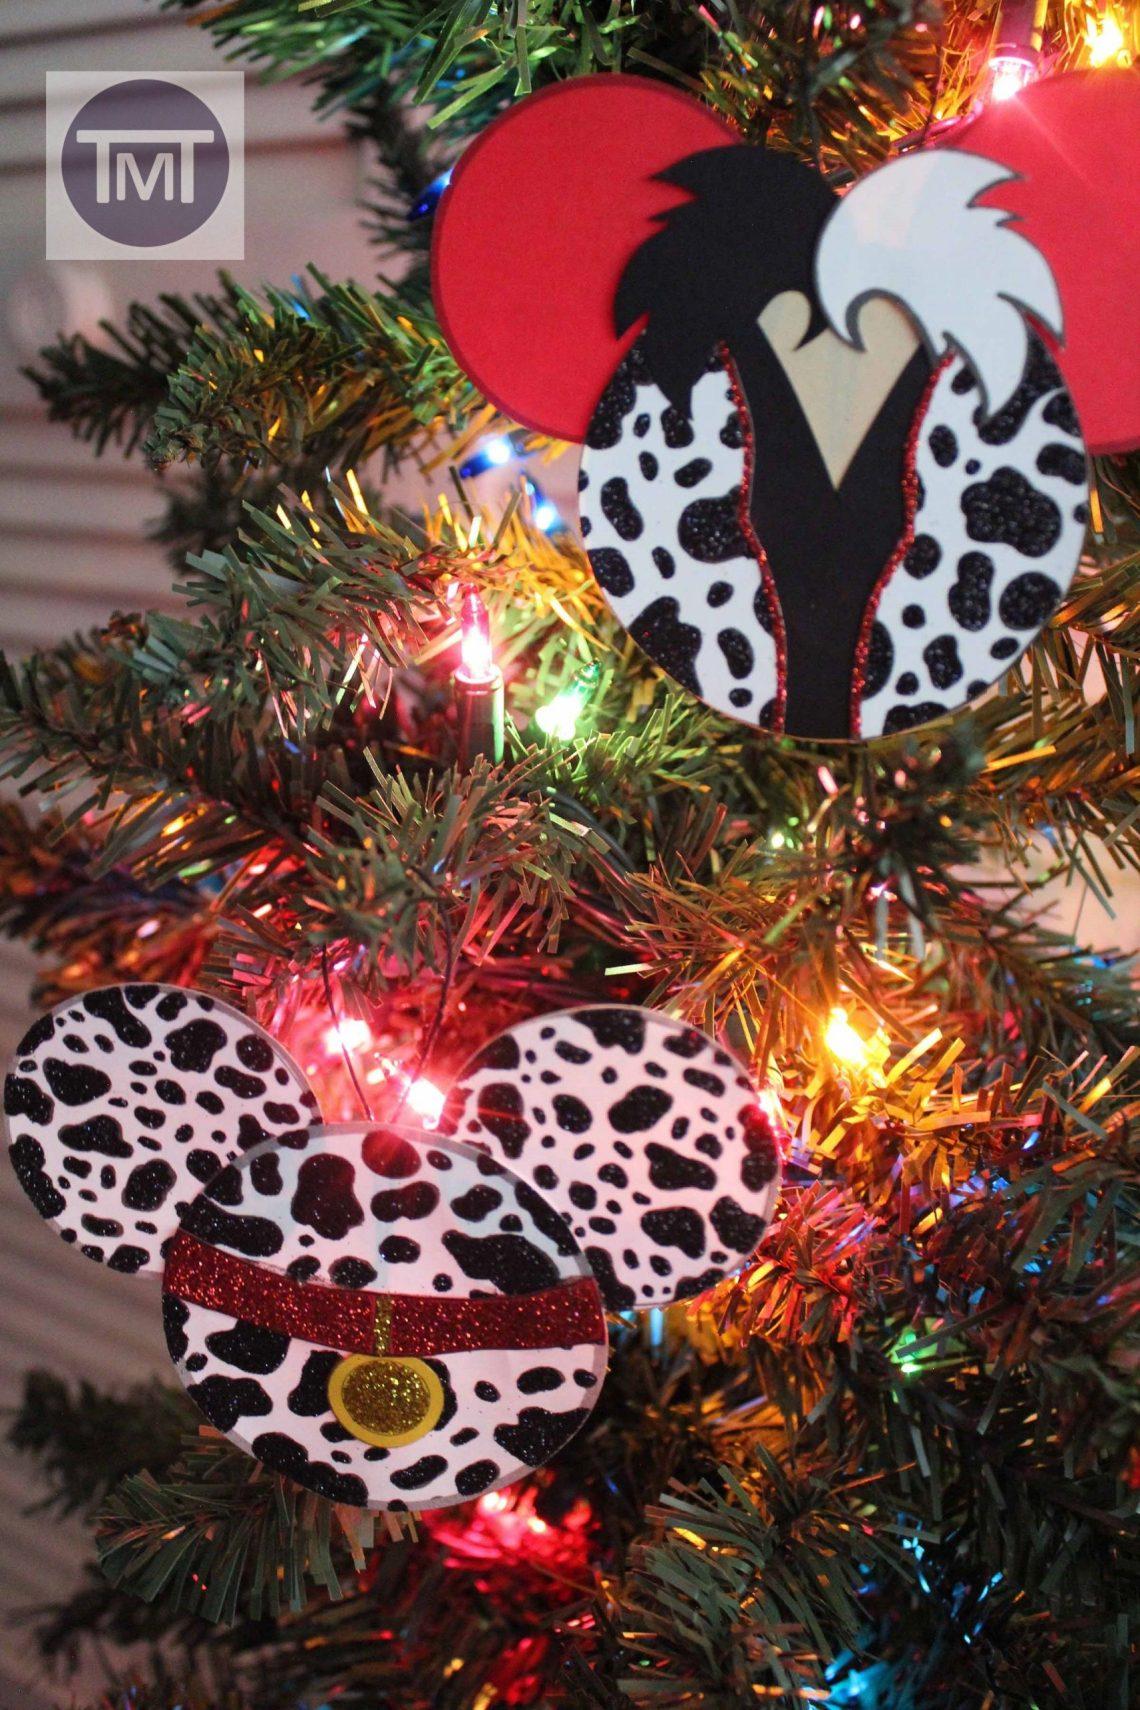 101 Dalmatians Inspired Disney Christmas Craft Printable